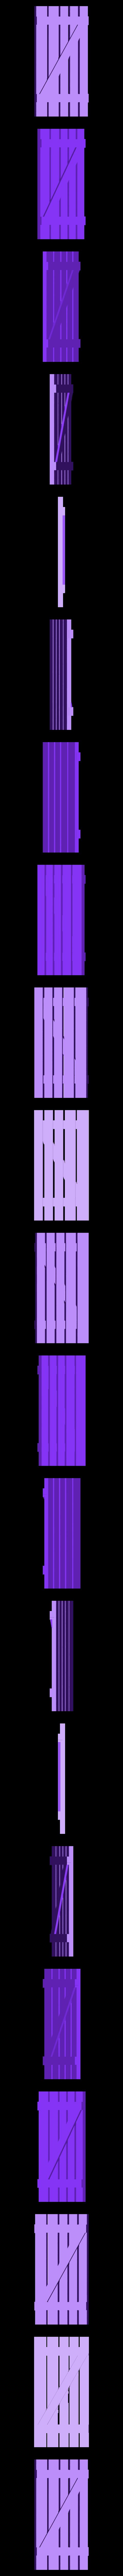 door_solid1.stl Download free STL file The Crannog • 3D printable template, Earsling